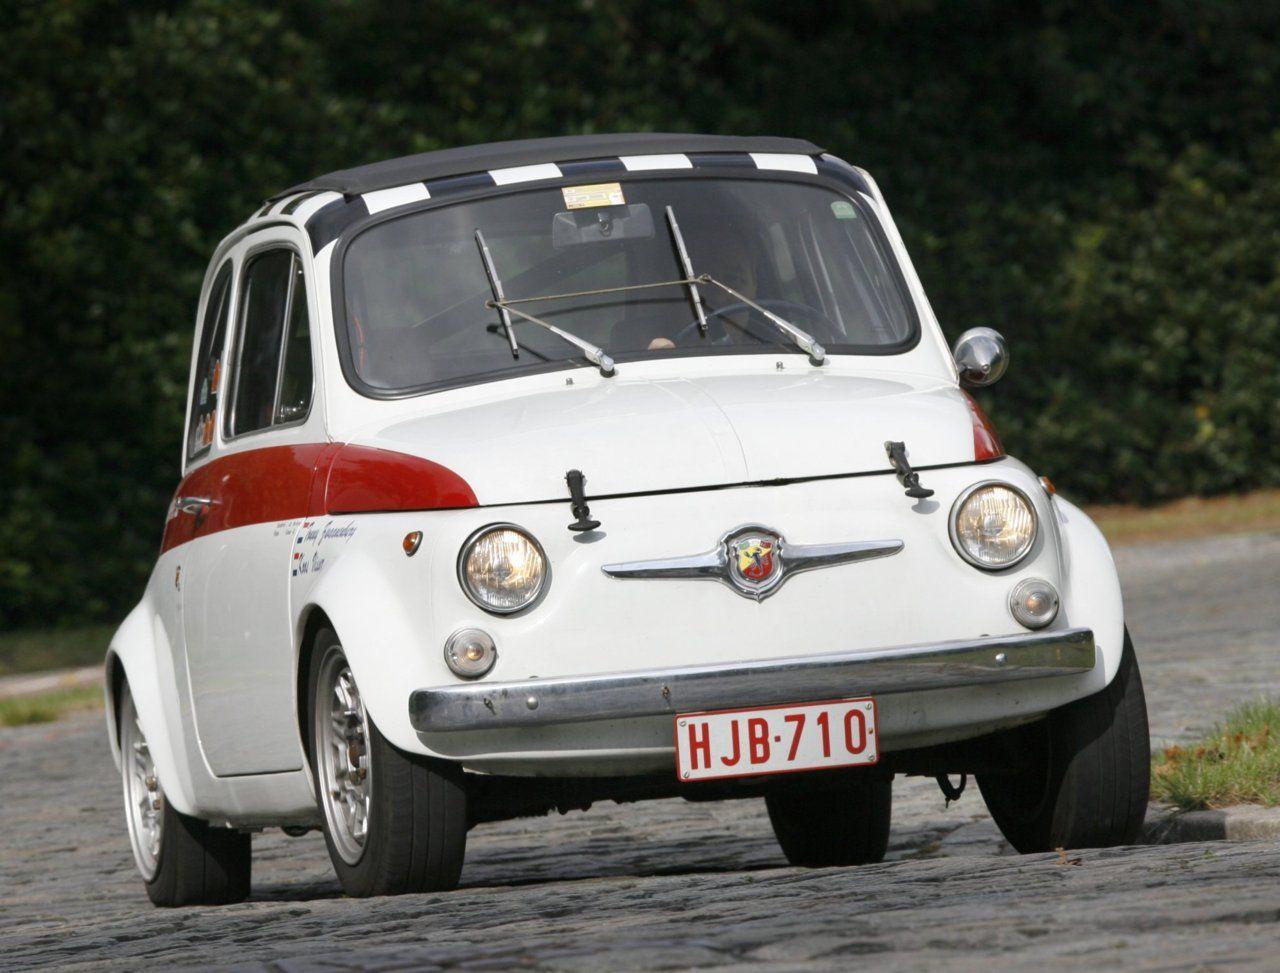 Fiat Abarth 695 SS | Italian cars | Pinterest | Fiat abarth, Fiat and